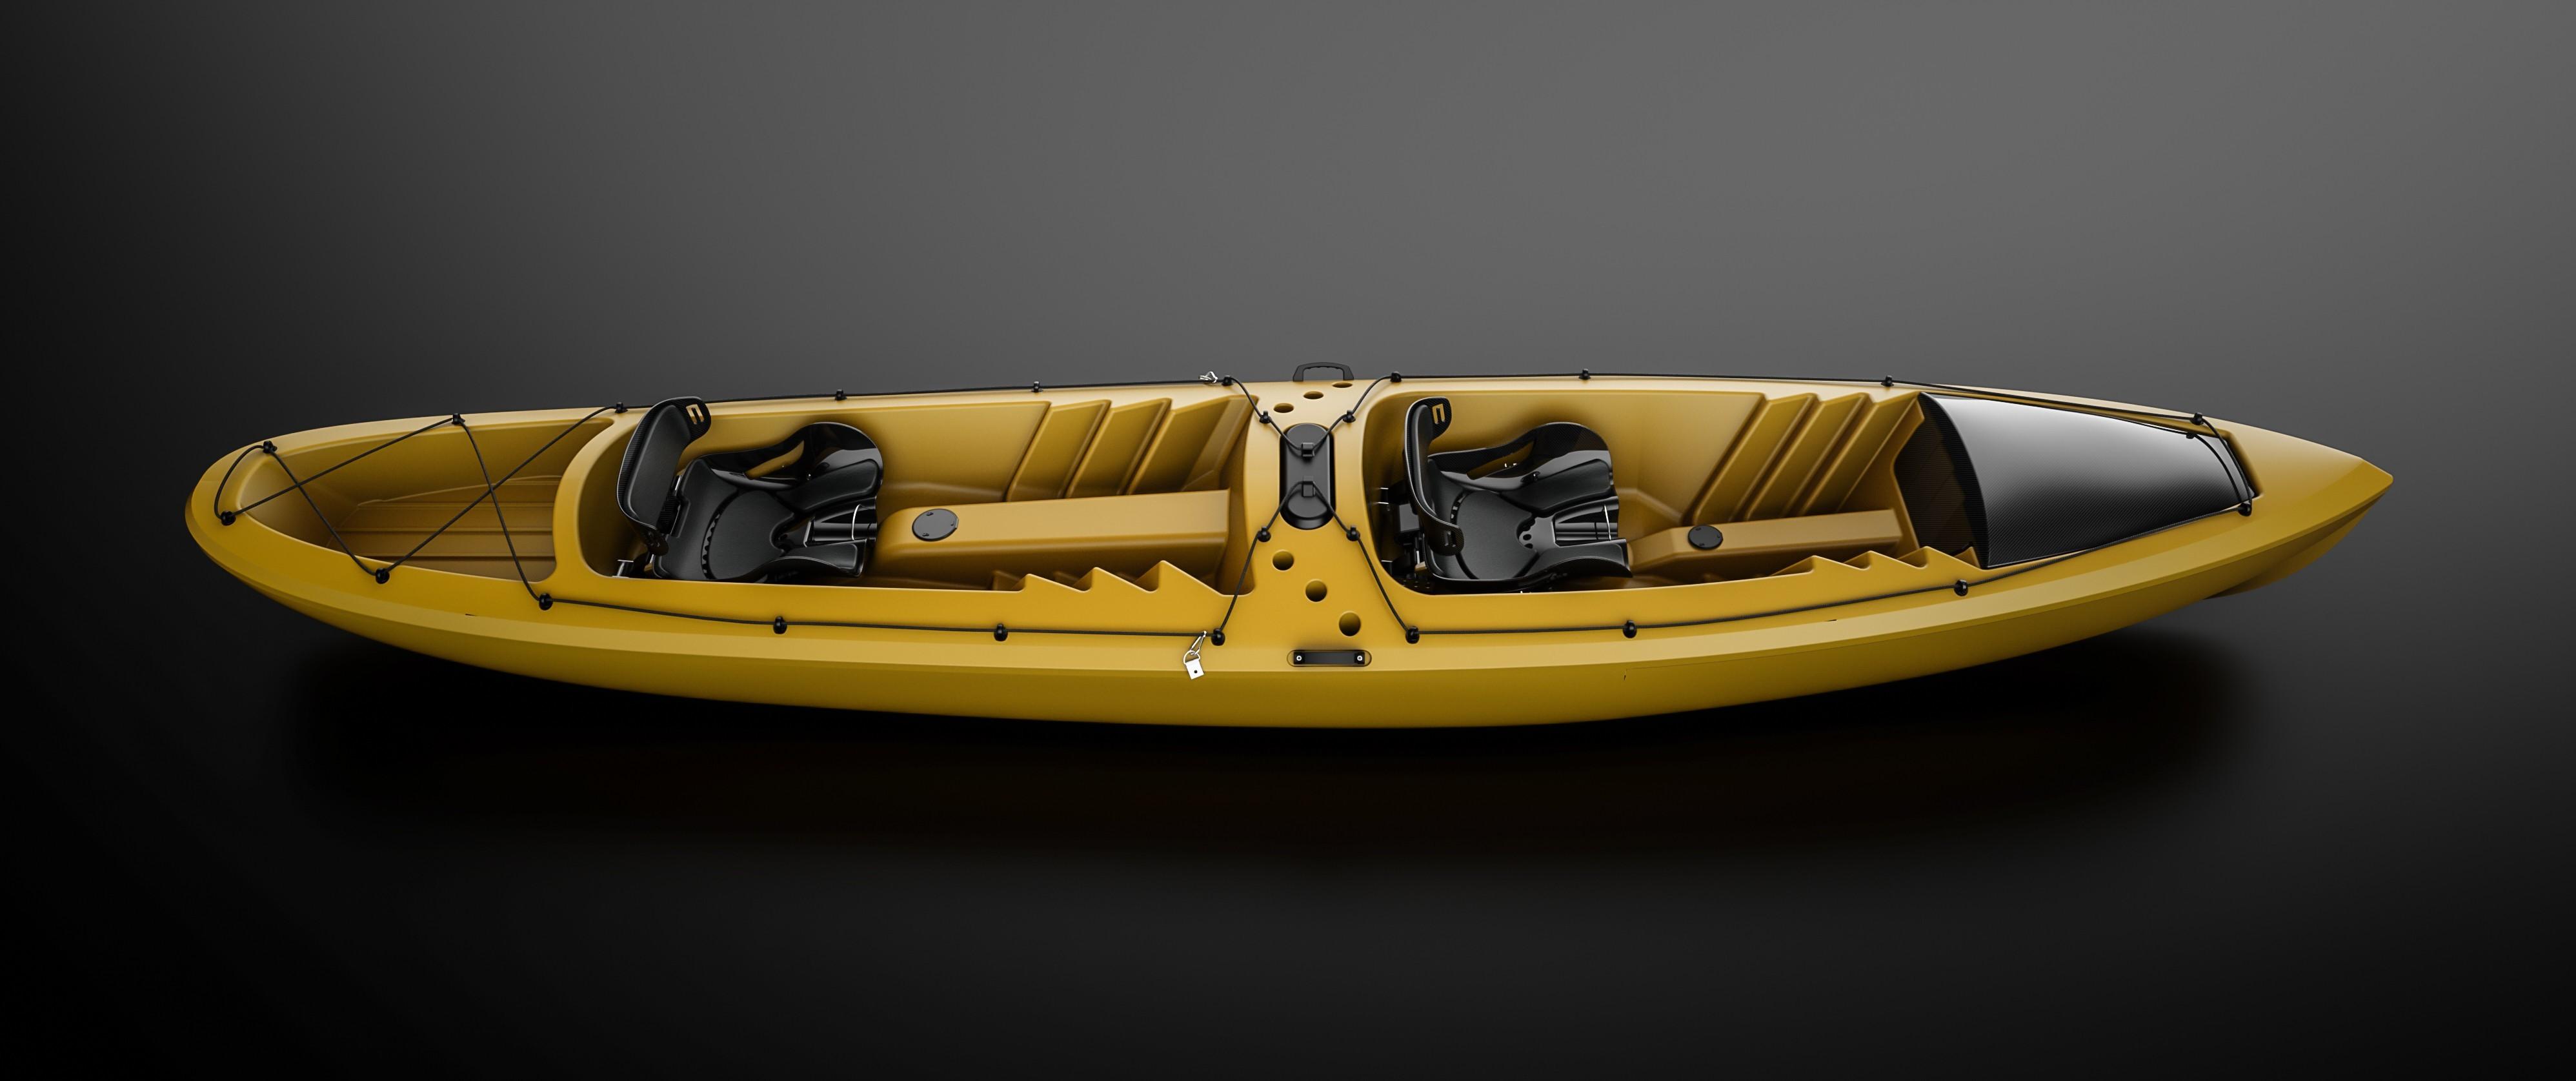 1-beauty.jpg Download STL file kayak • Design to 3D print, oussamaonoumi